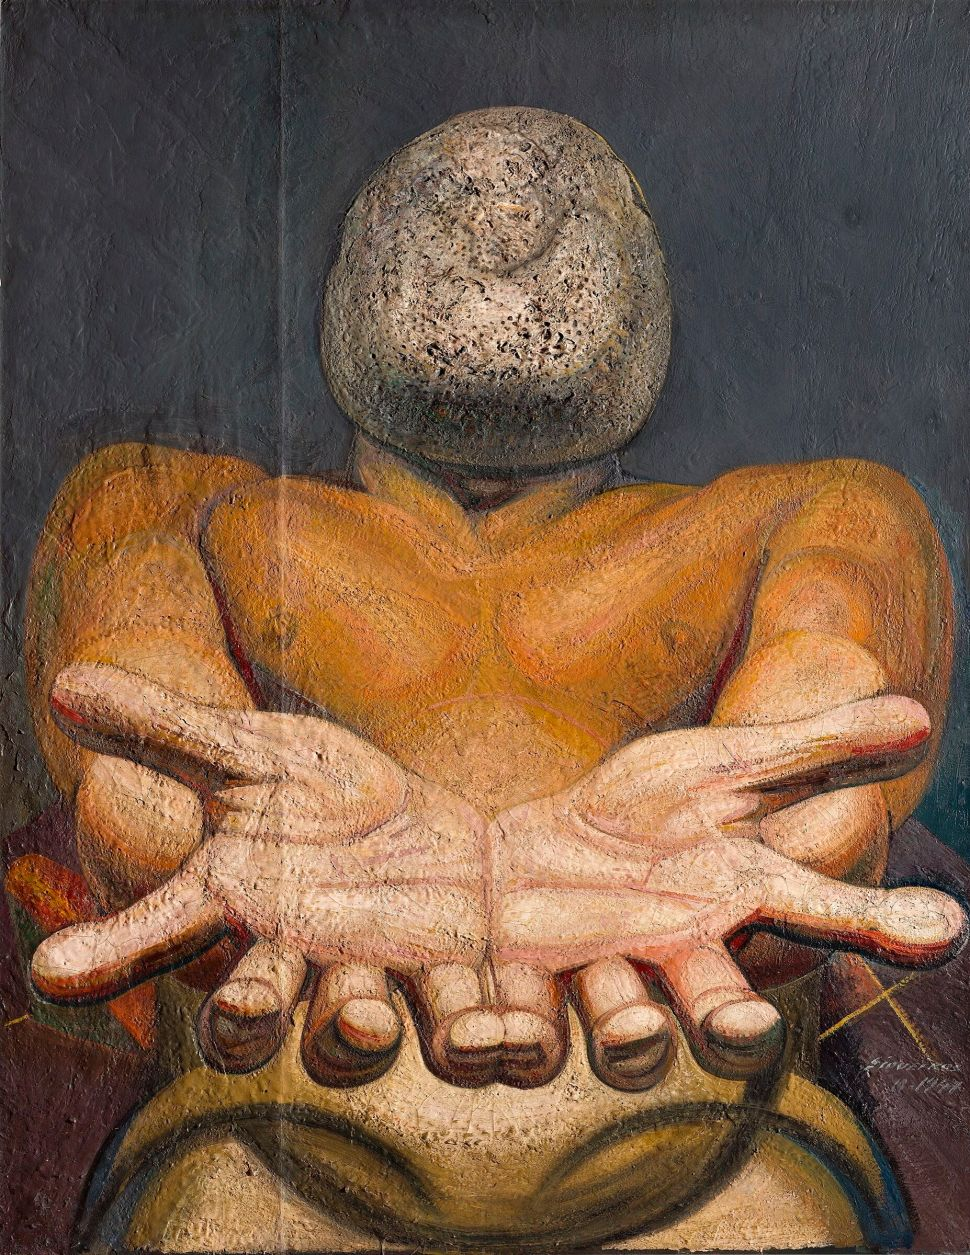 David Alfaro Siqueiros, Our Present Image, 1947